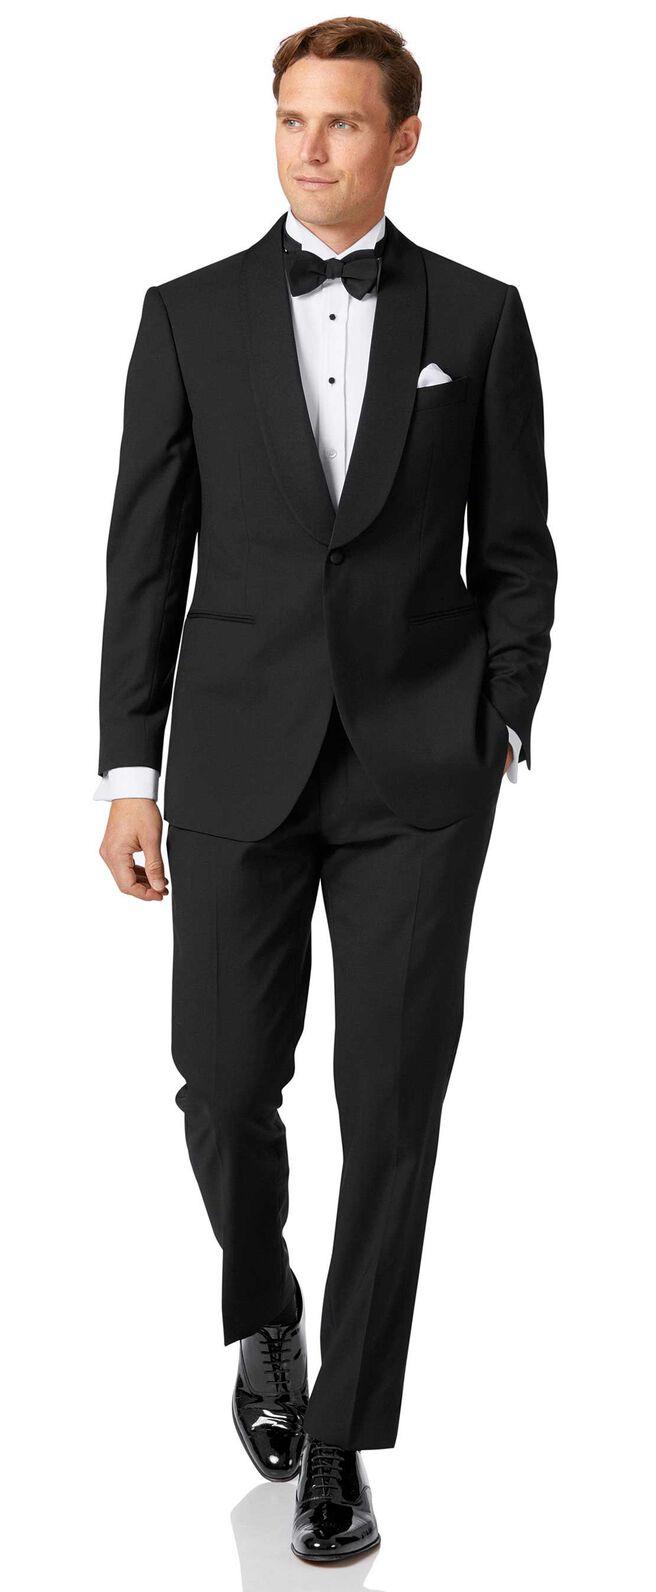 Black slim fit shawl collar dinner suit